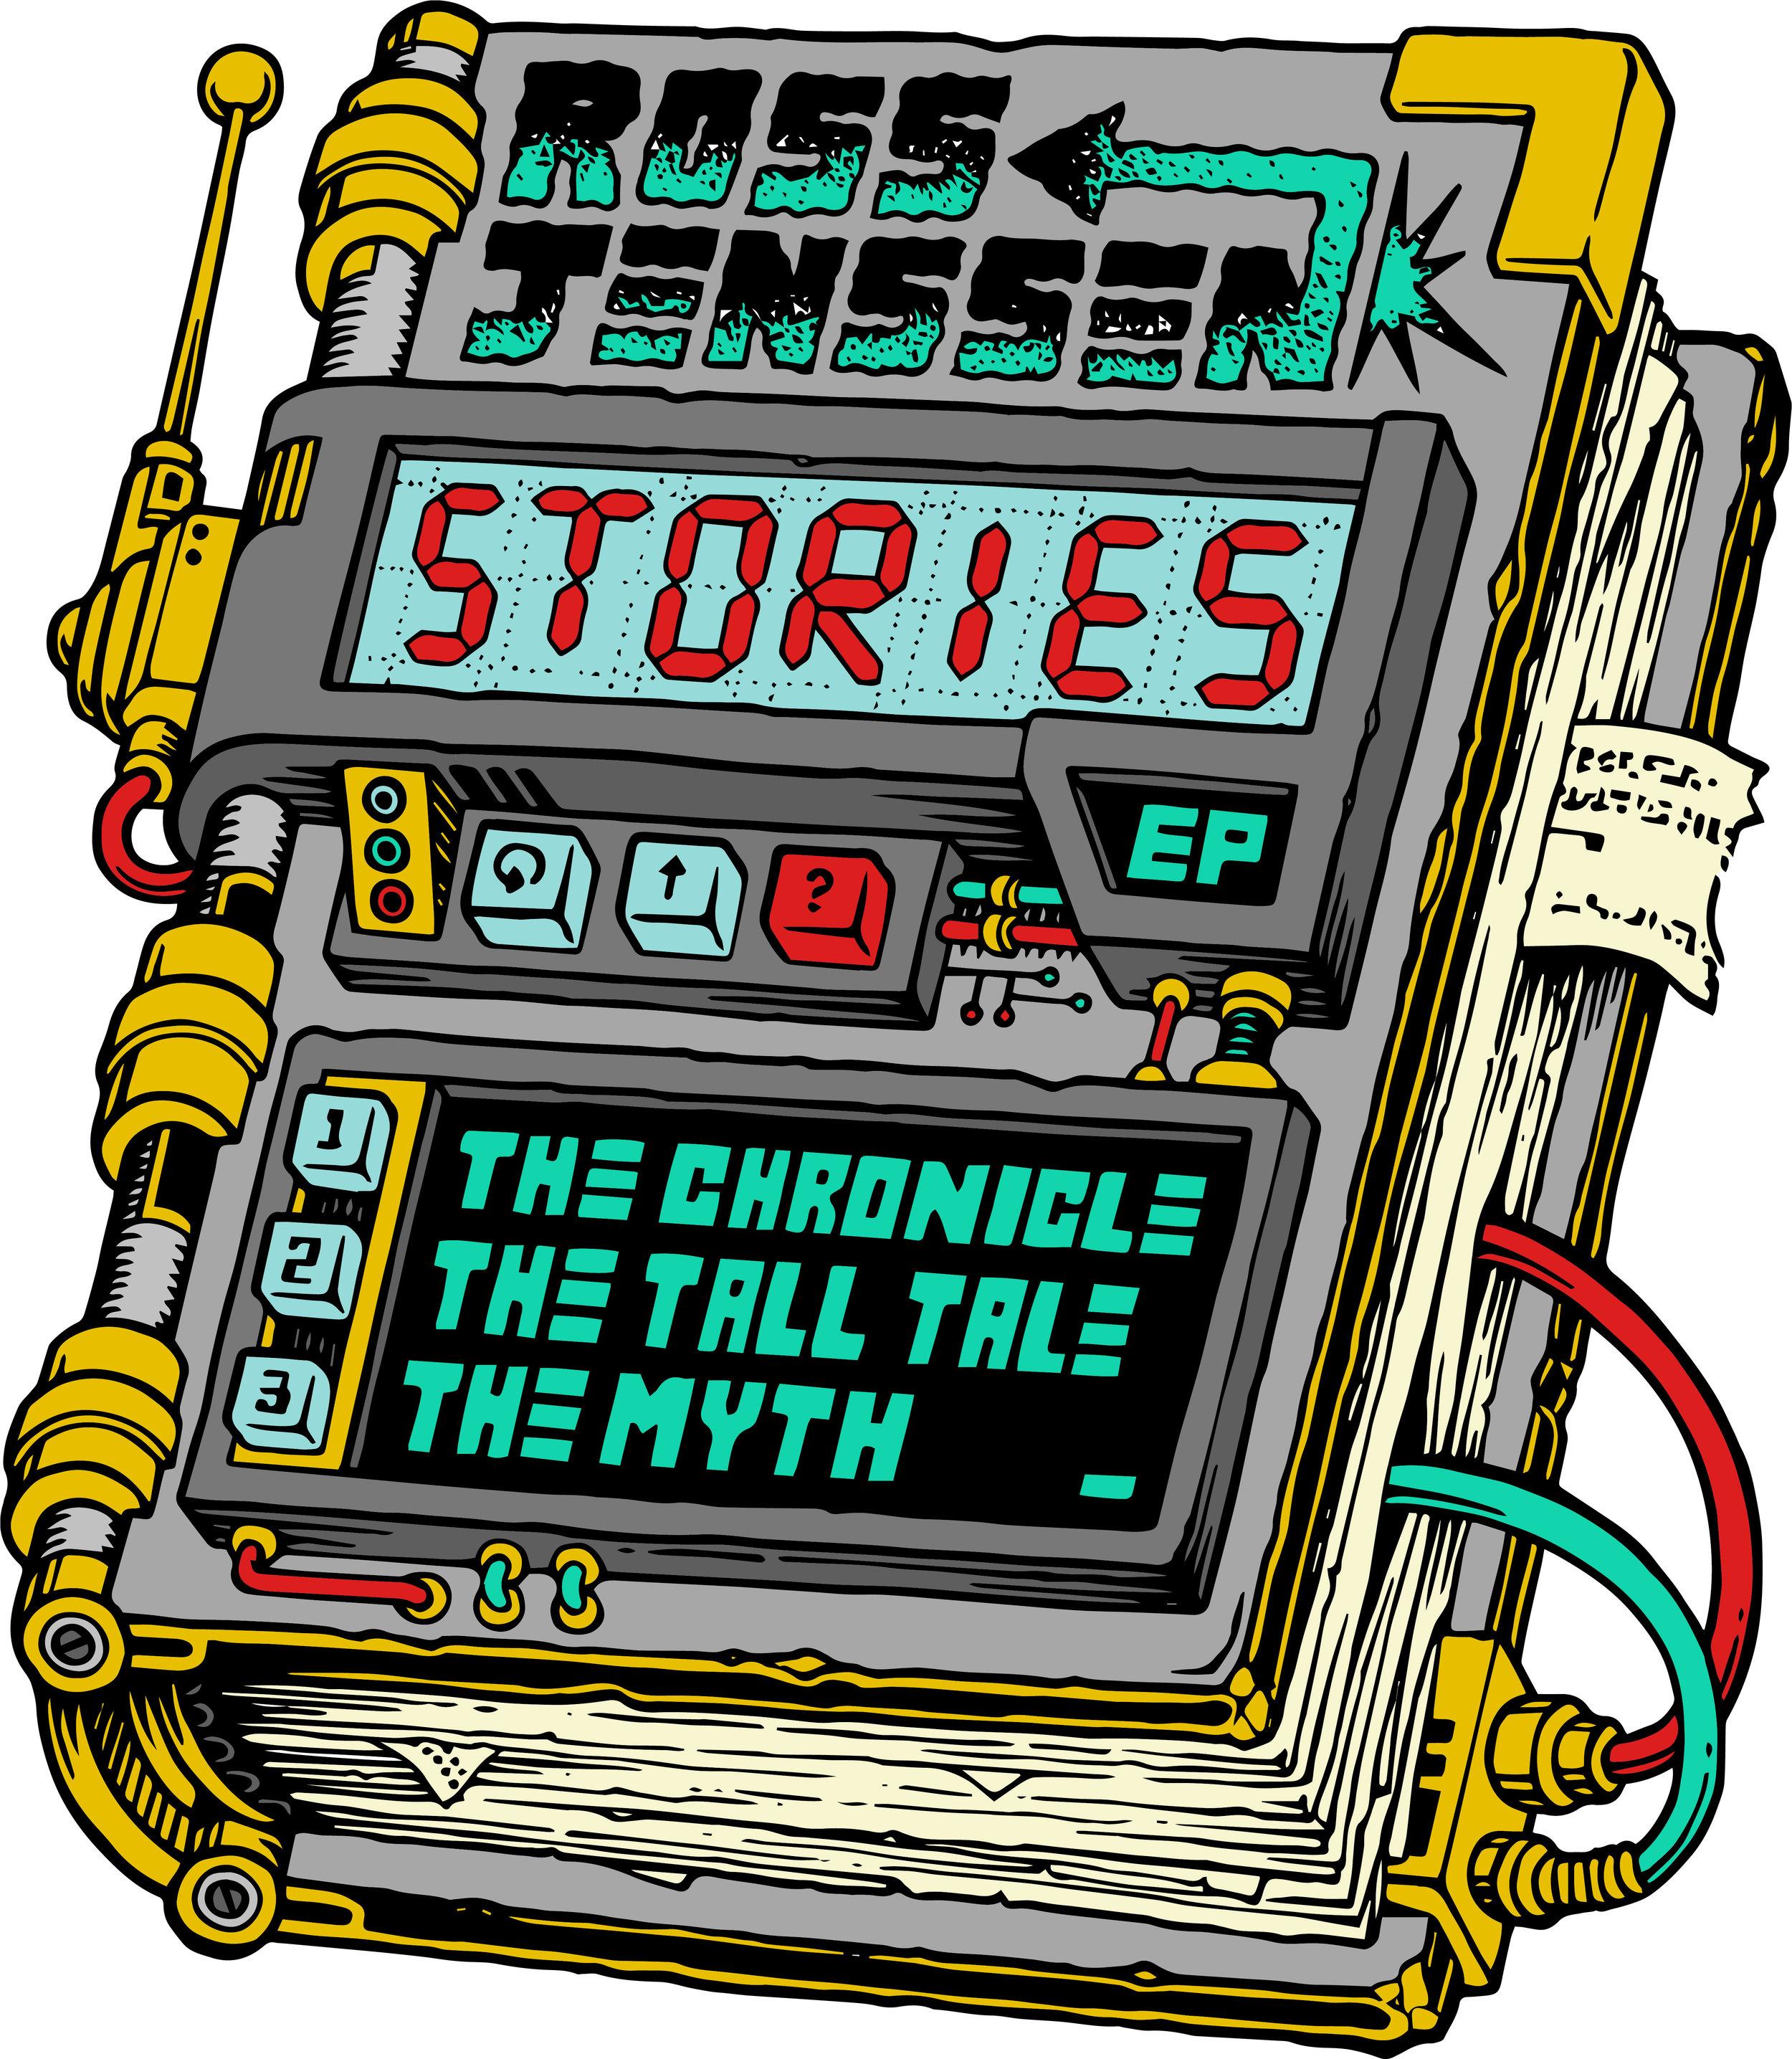 Stoires cover for bandcamp (1).jpg